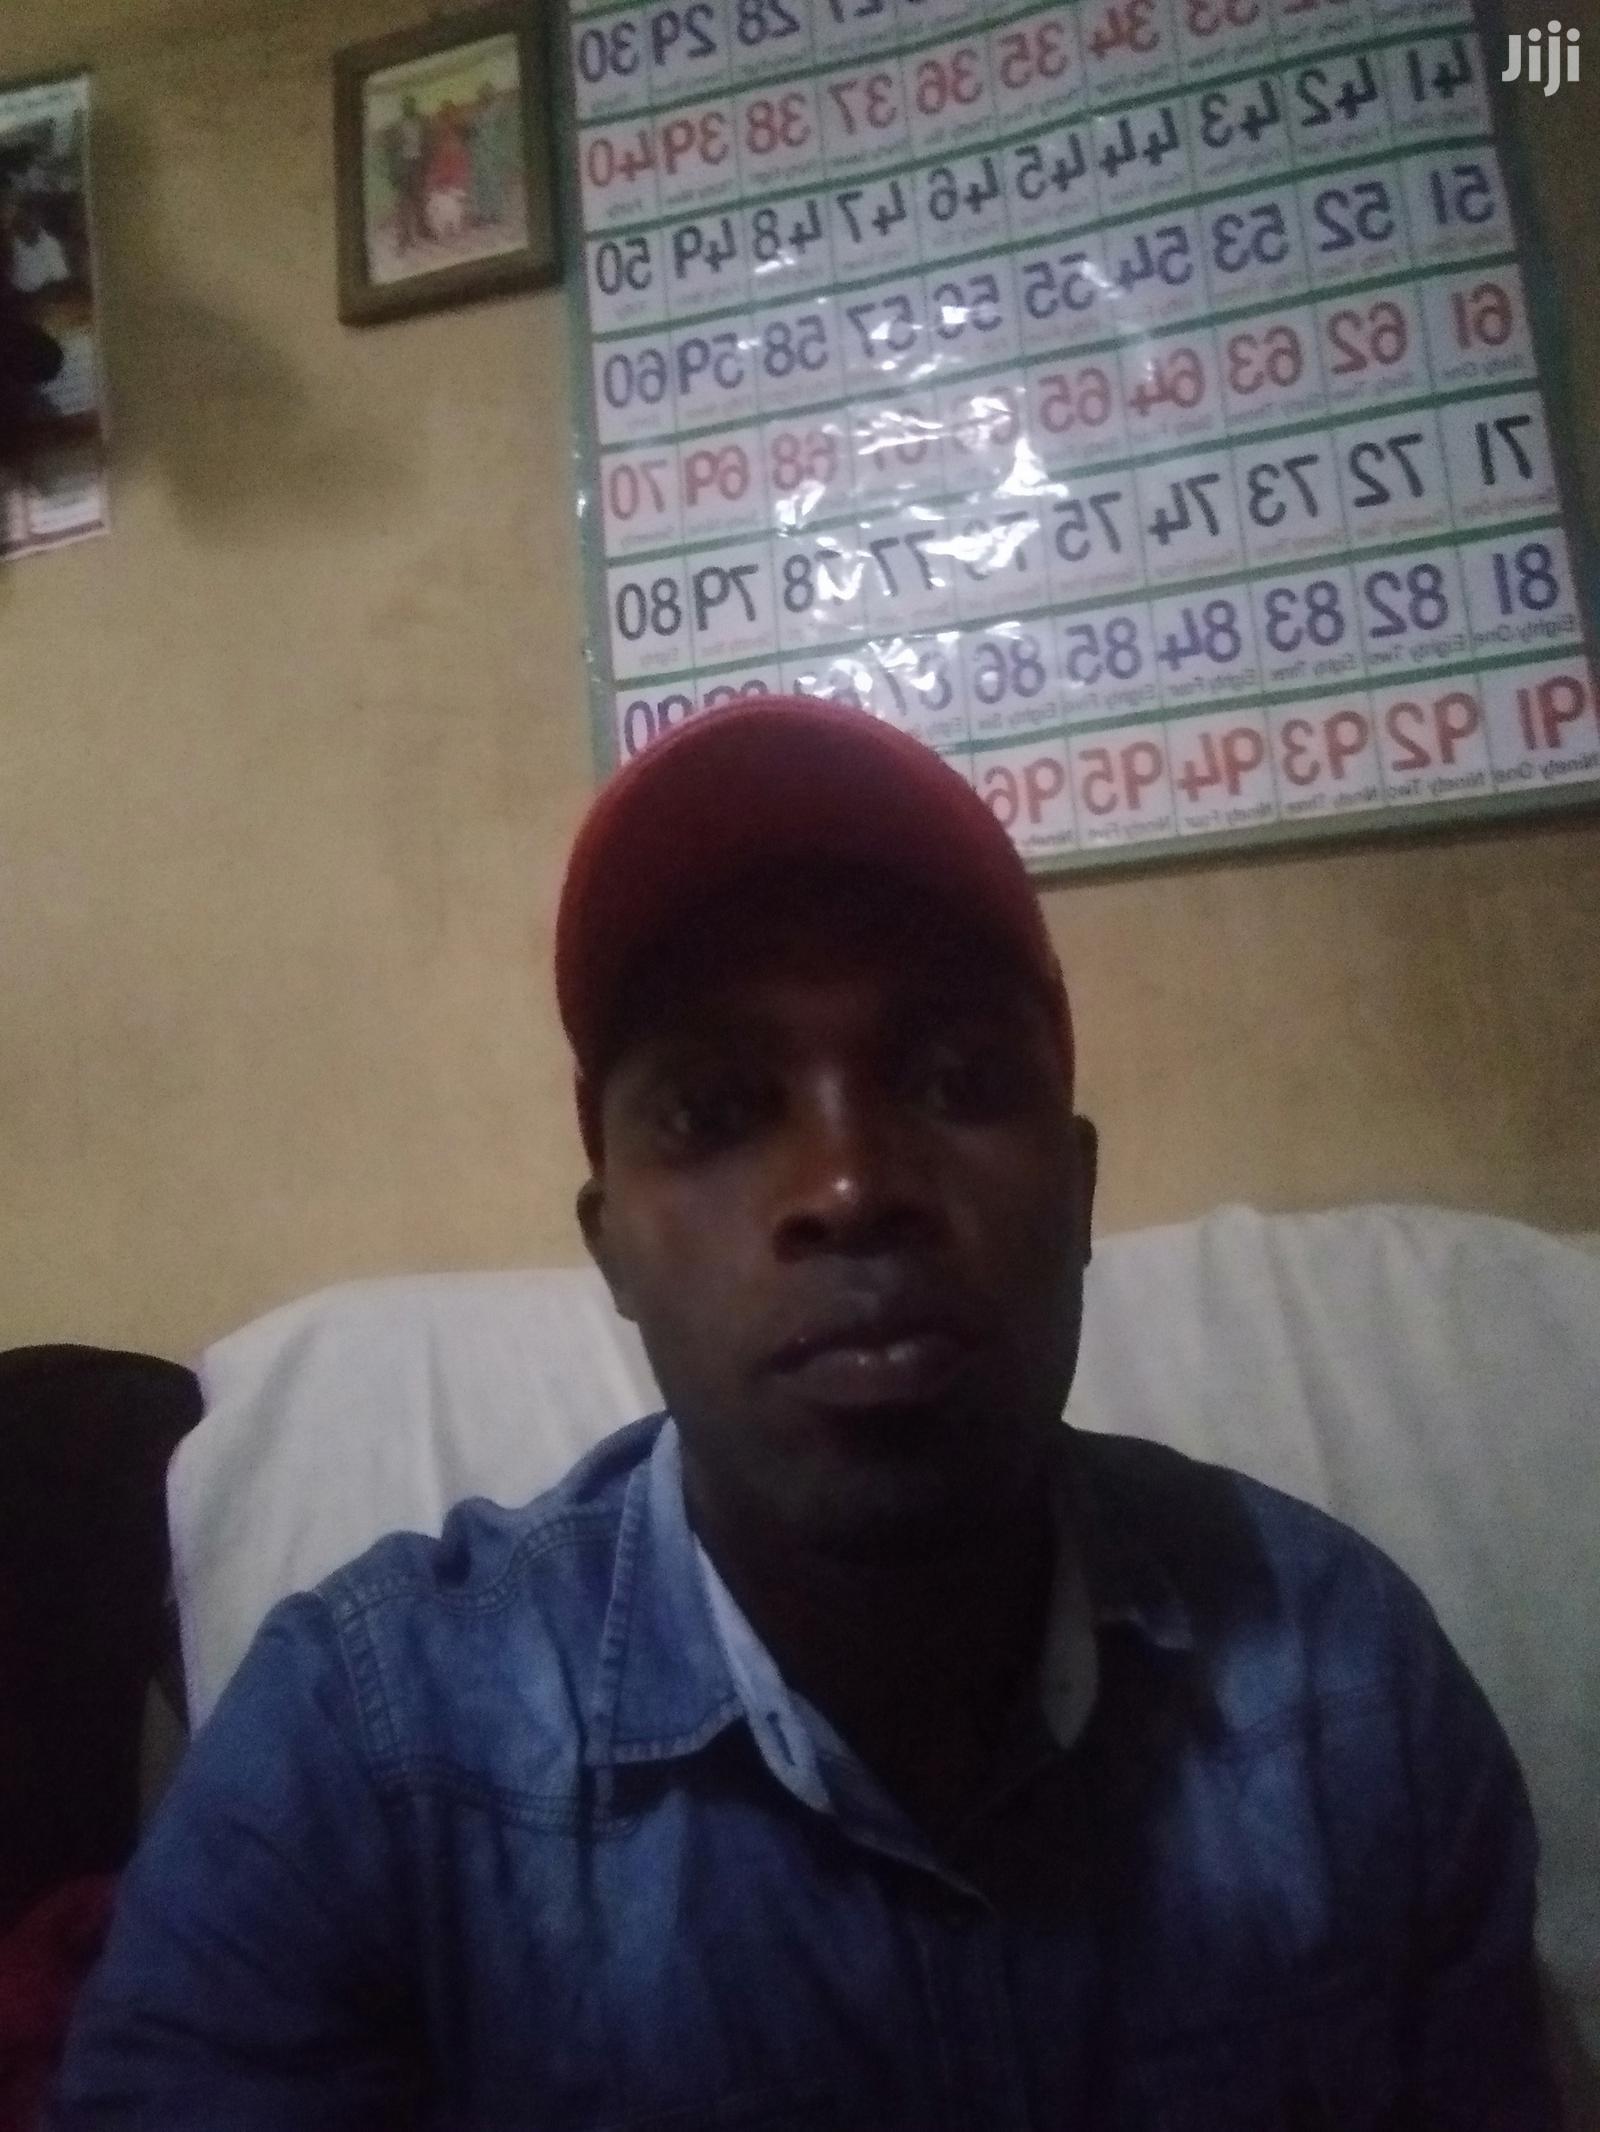 Technicians Required Cctv Dstv And Alarm System | Construction & Skilled trade CVs for sale in Kariobangi North, Nairobi, Kenya